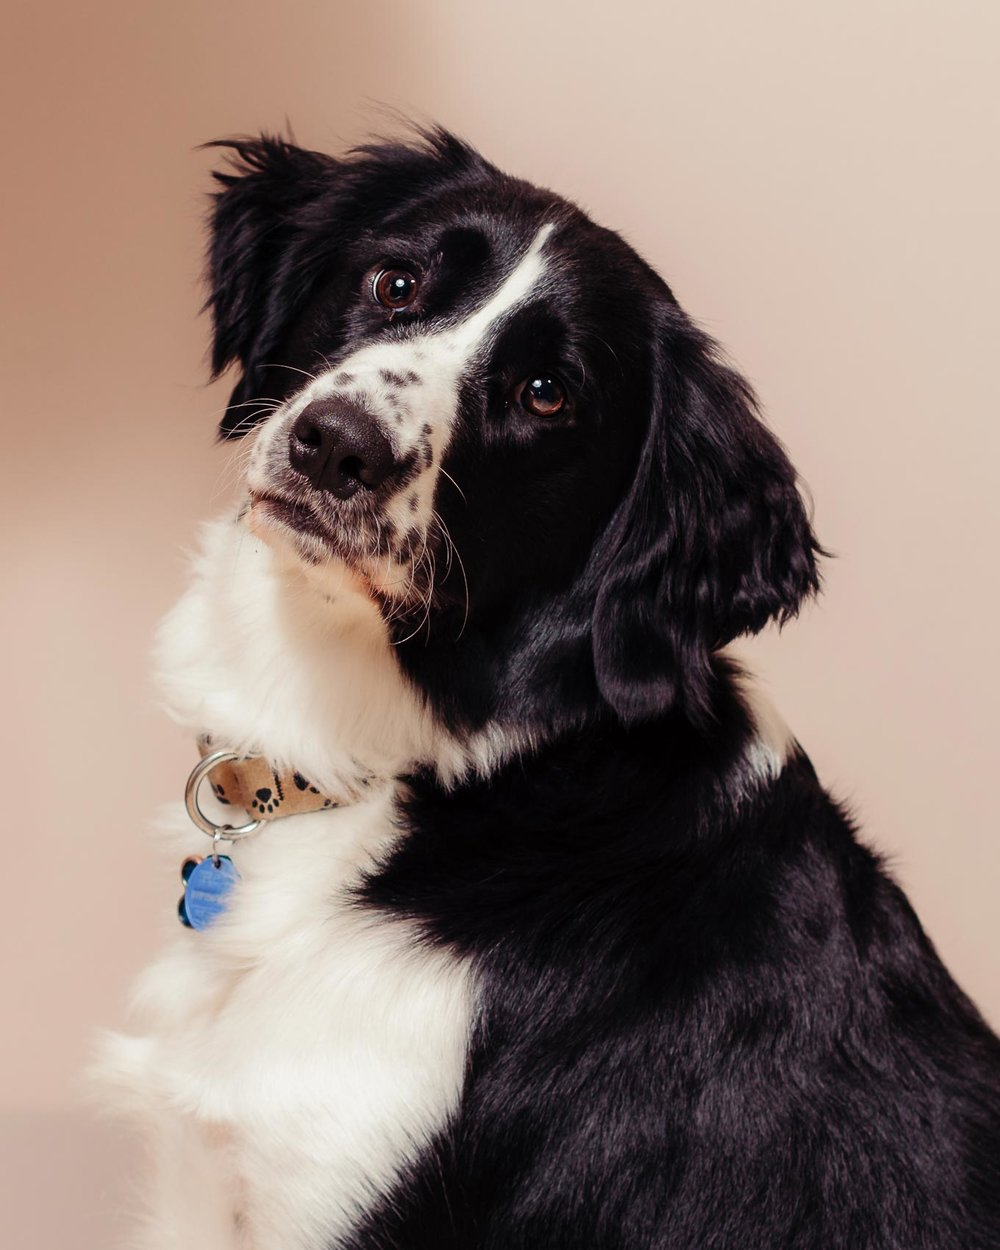 Studio-portrait-of-a-Springer-Spaniel--named-Danny-taken-by-Orlando-Pet-Photography.jpg